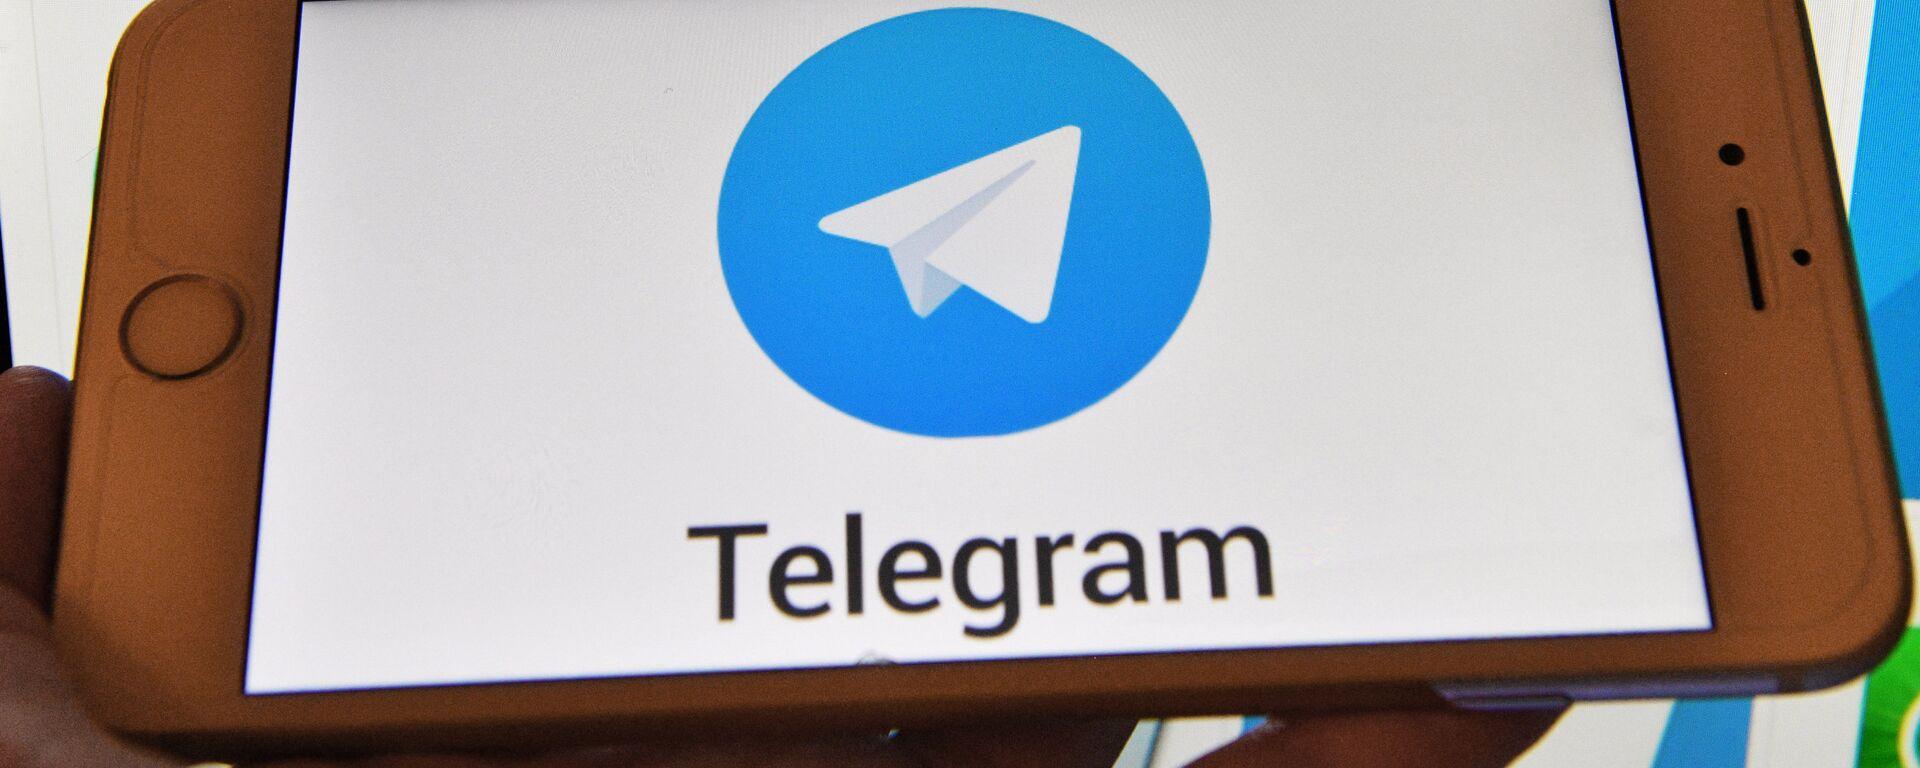 Telegram - Sputnik Srbija, 1920, 04.10.2021